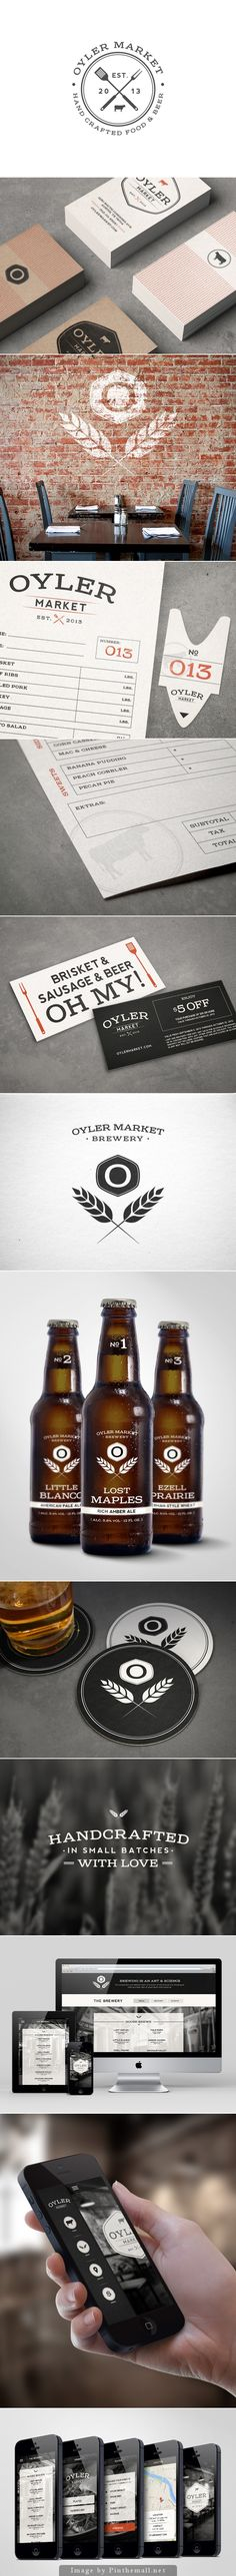 Oyler Market #branding #identity #design